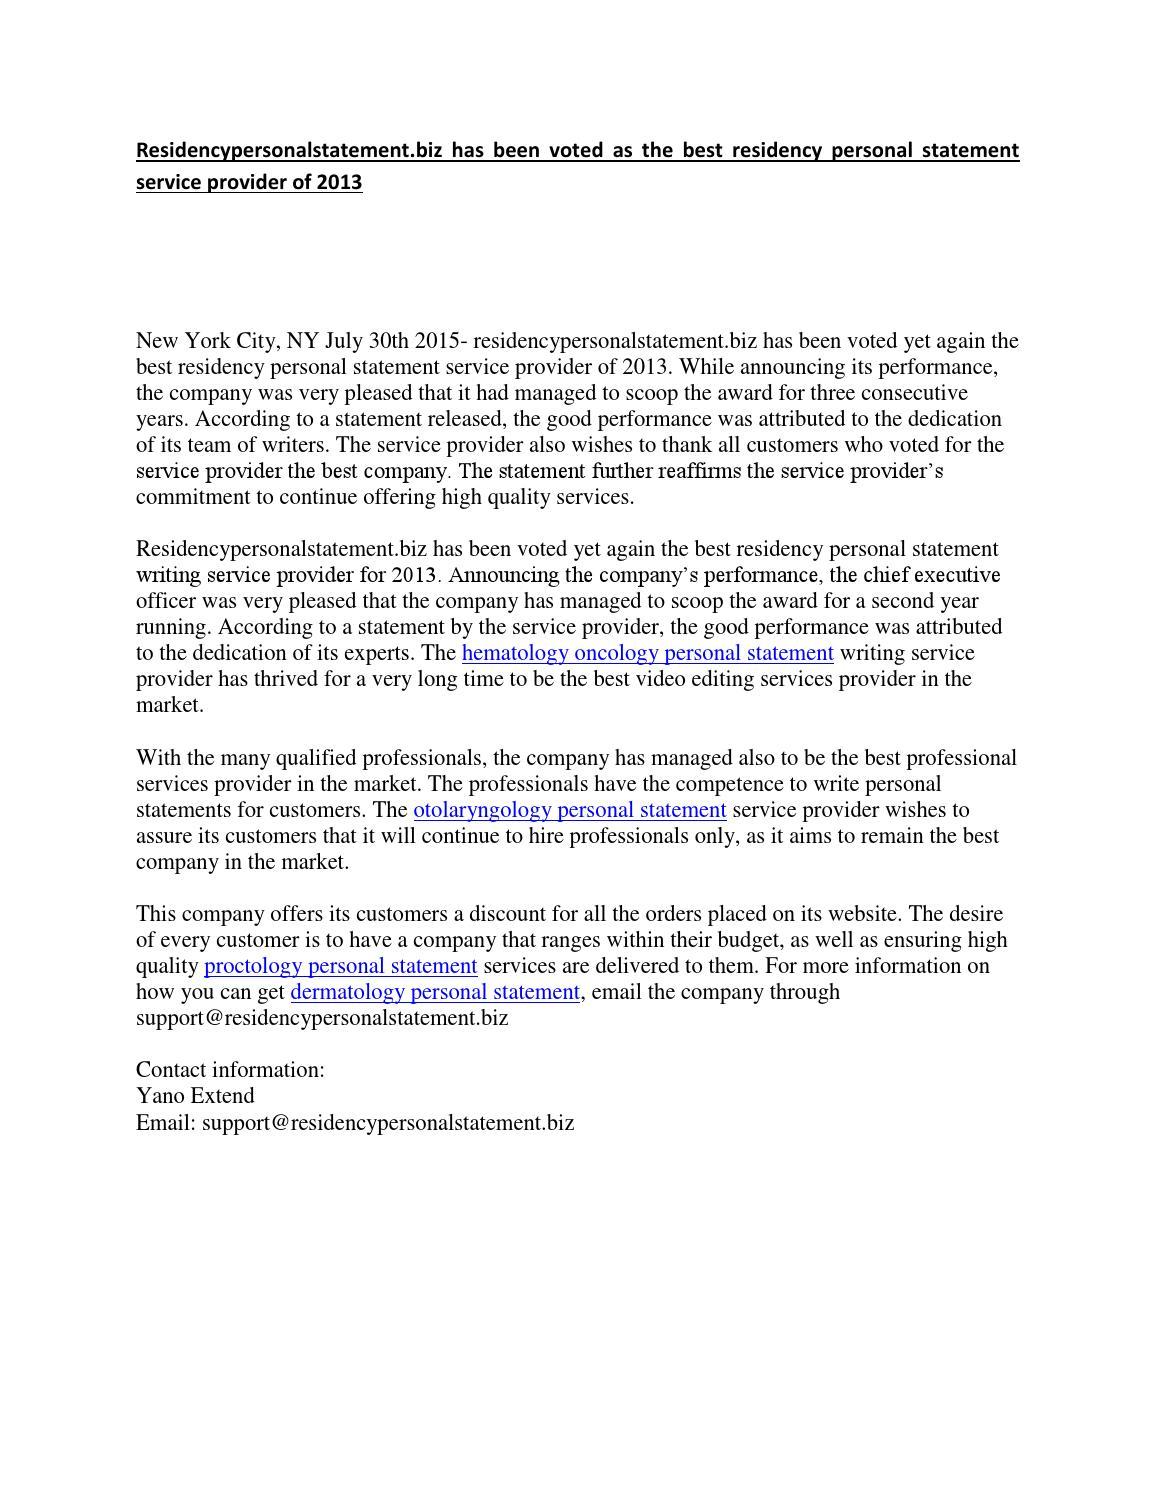 essayedge residency personal statement